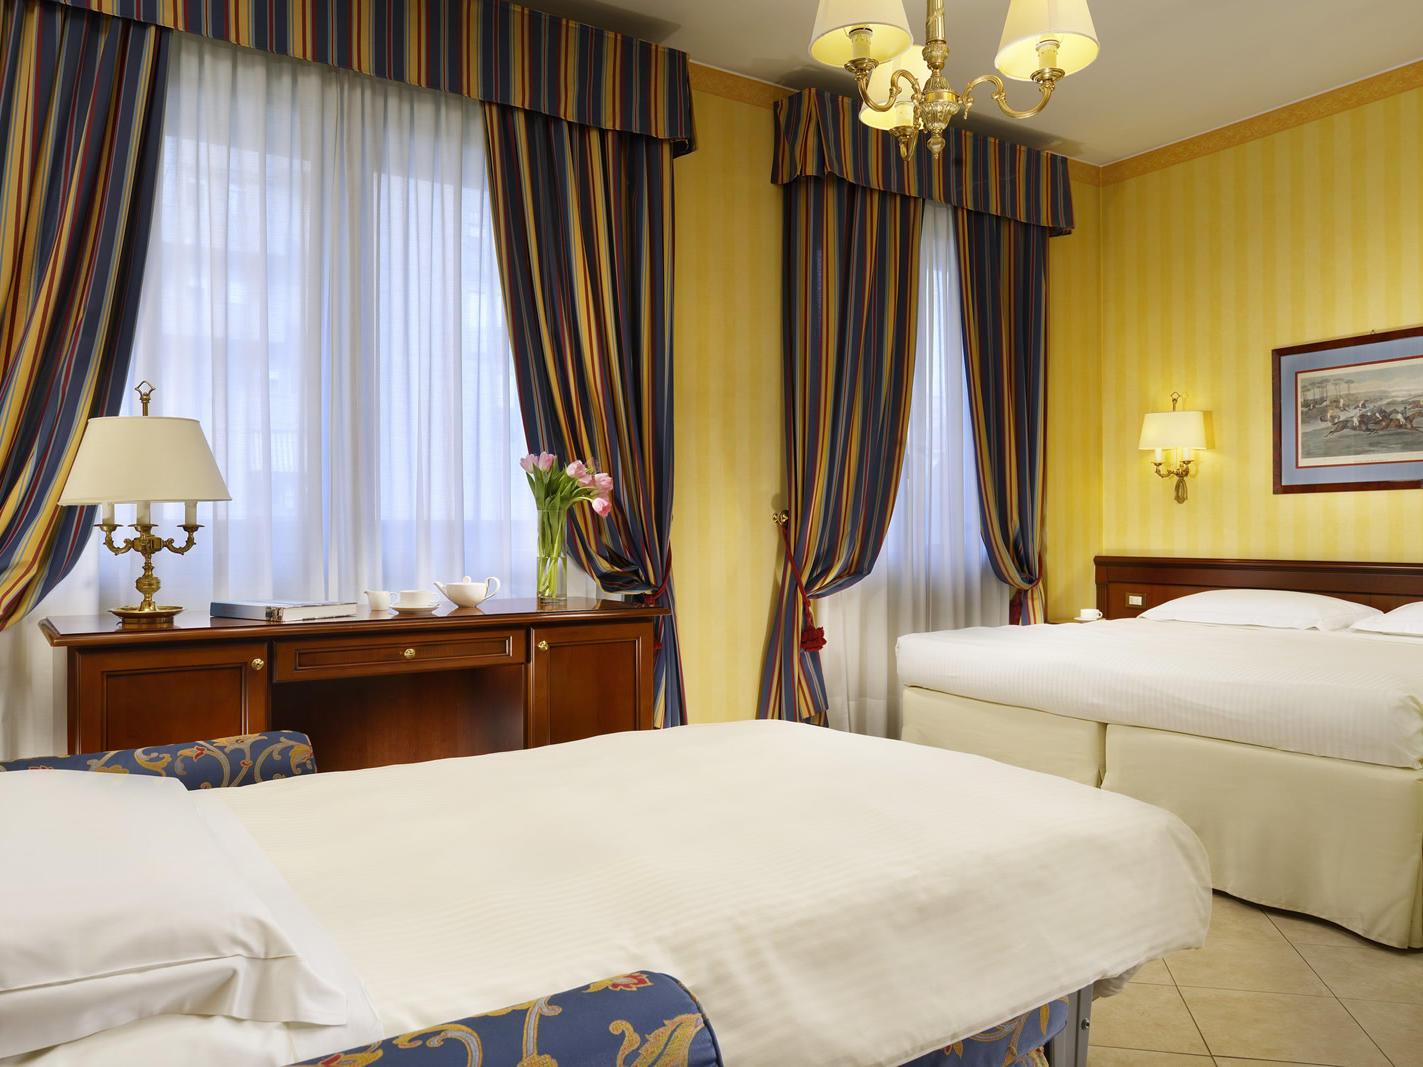 Family Room | Linea Uno Hotel & Residence Milano